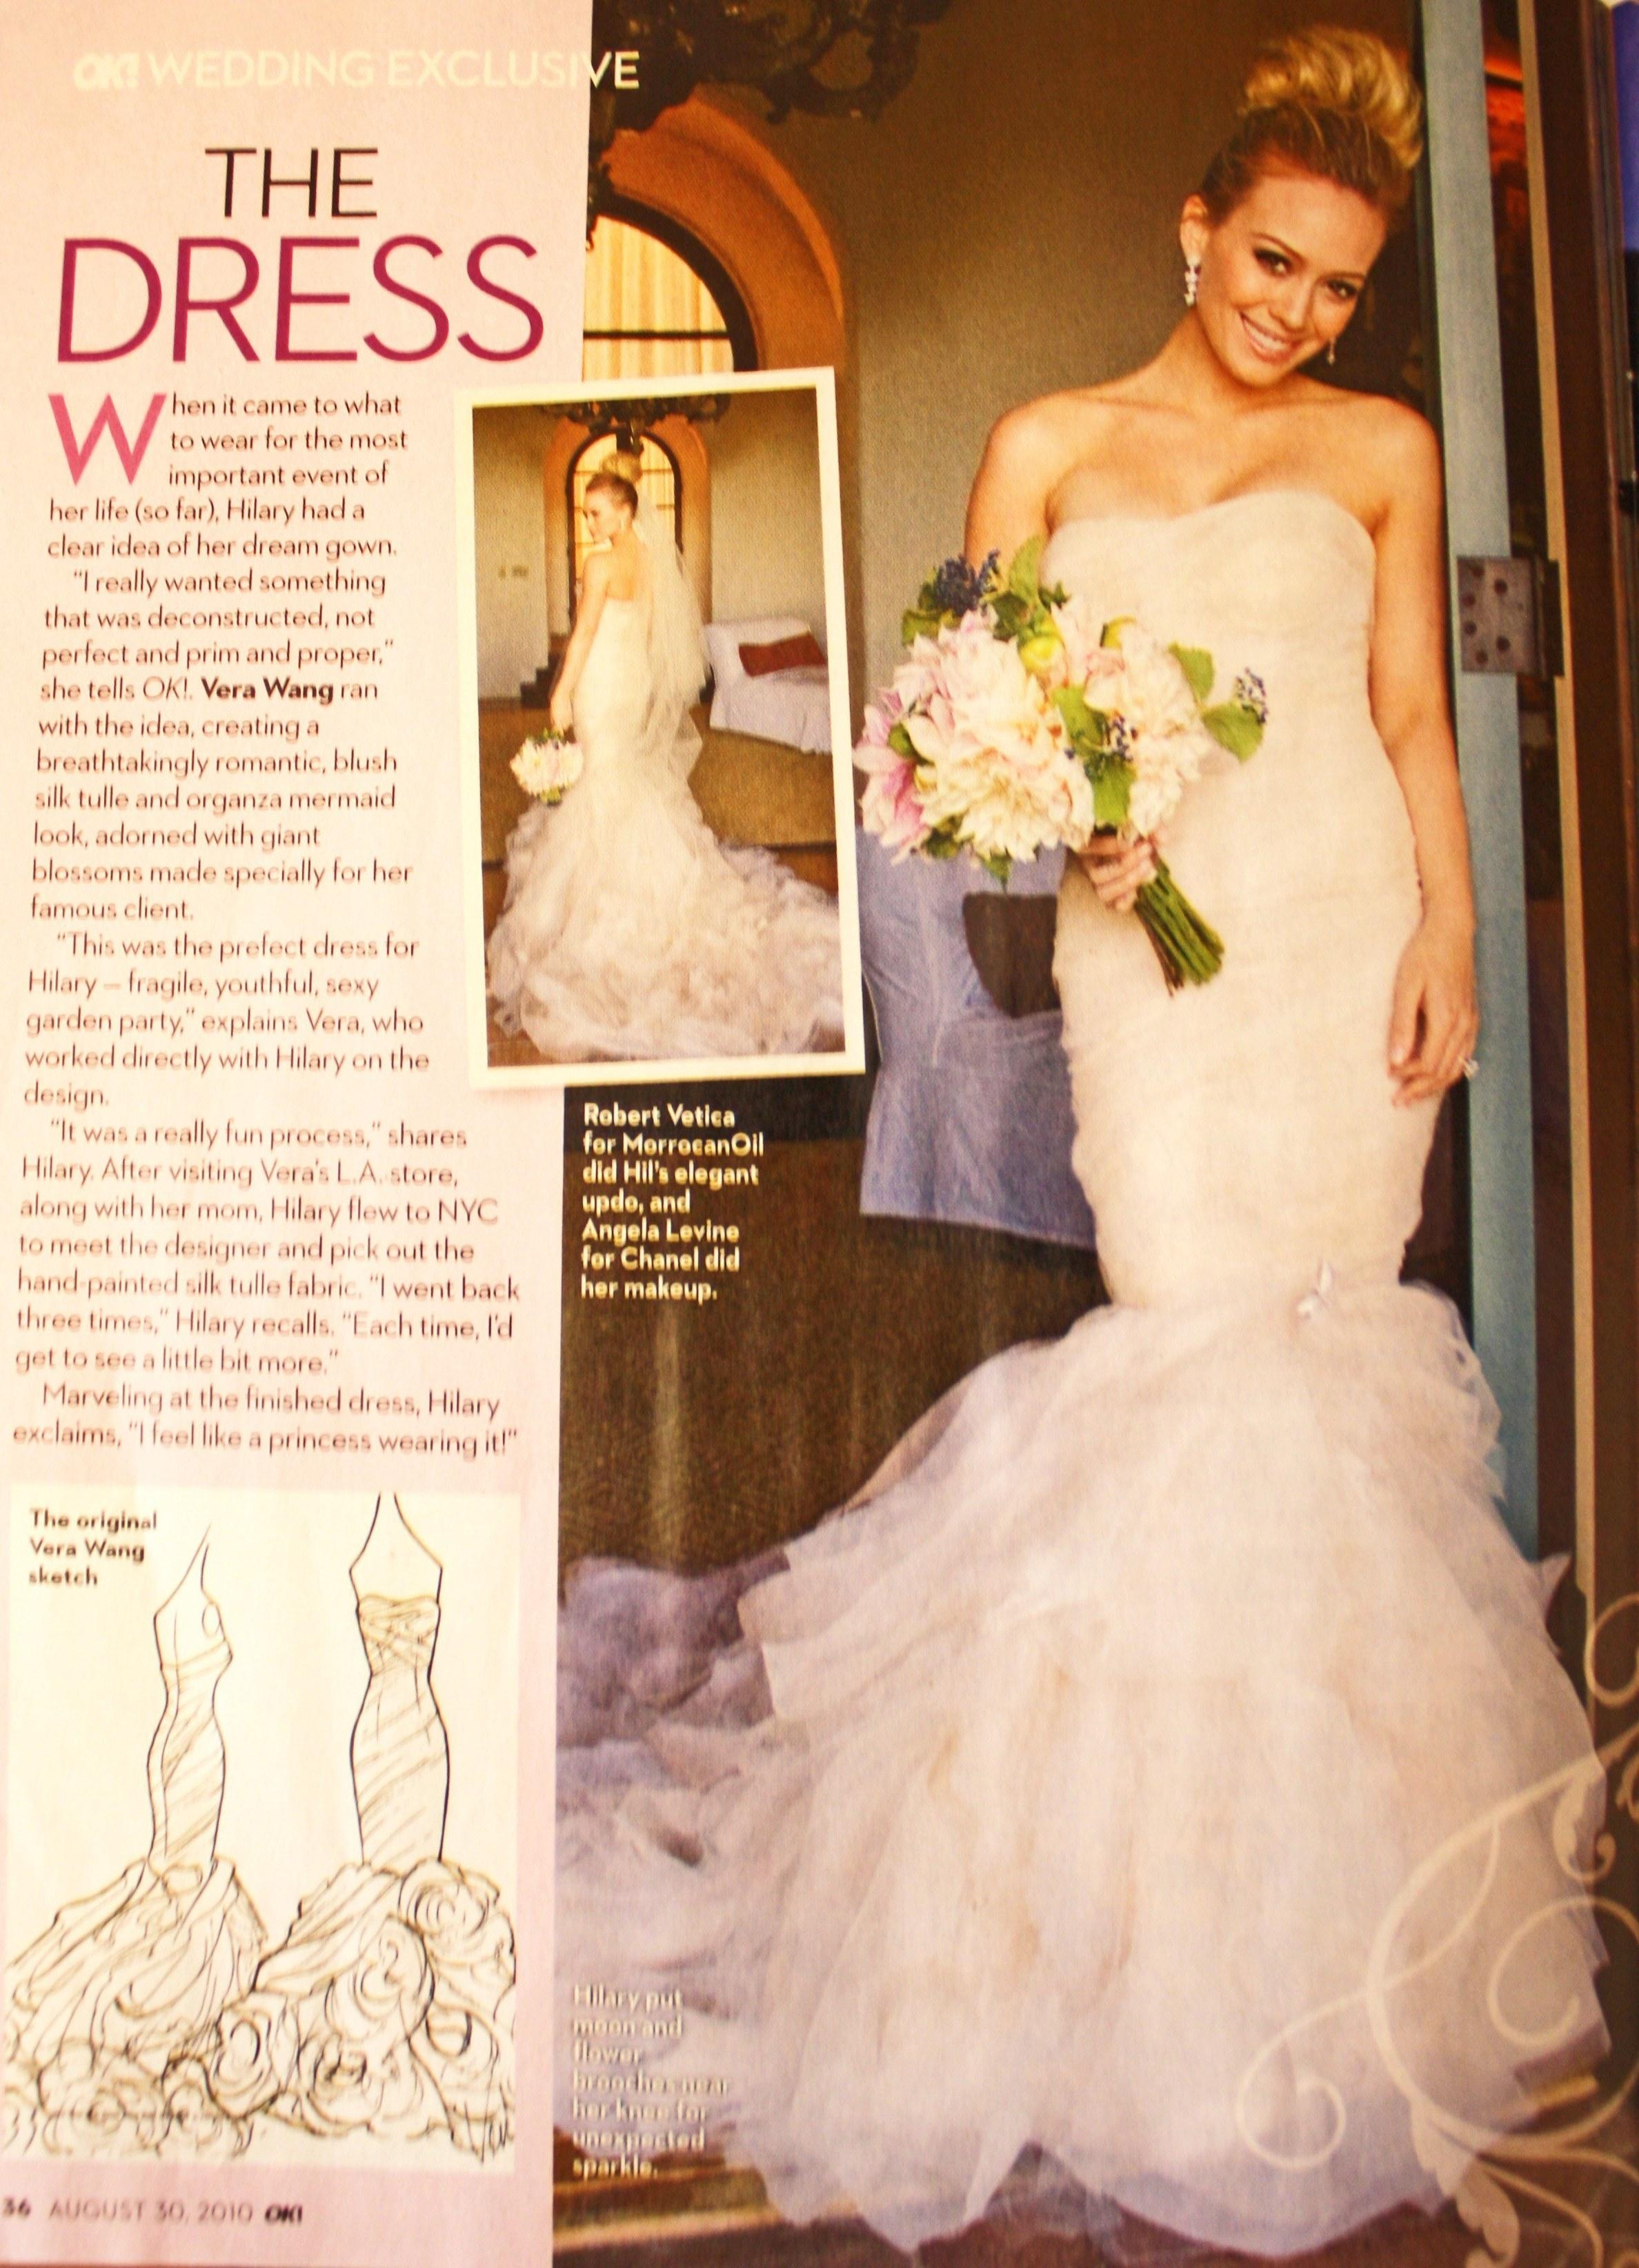 Model Dress Bridesmaid Hijab Qwdq Wedding Ideas White and Gold Wedding Dress the Newest